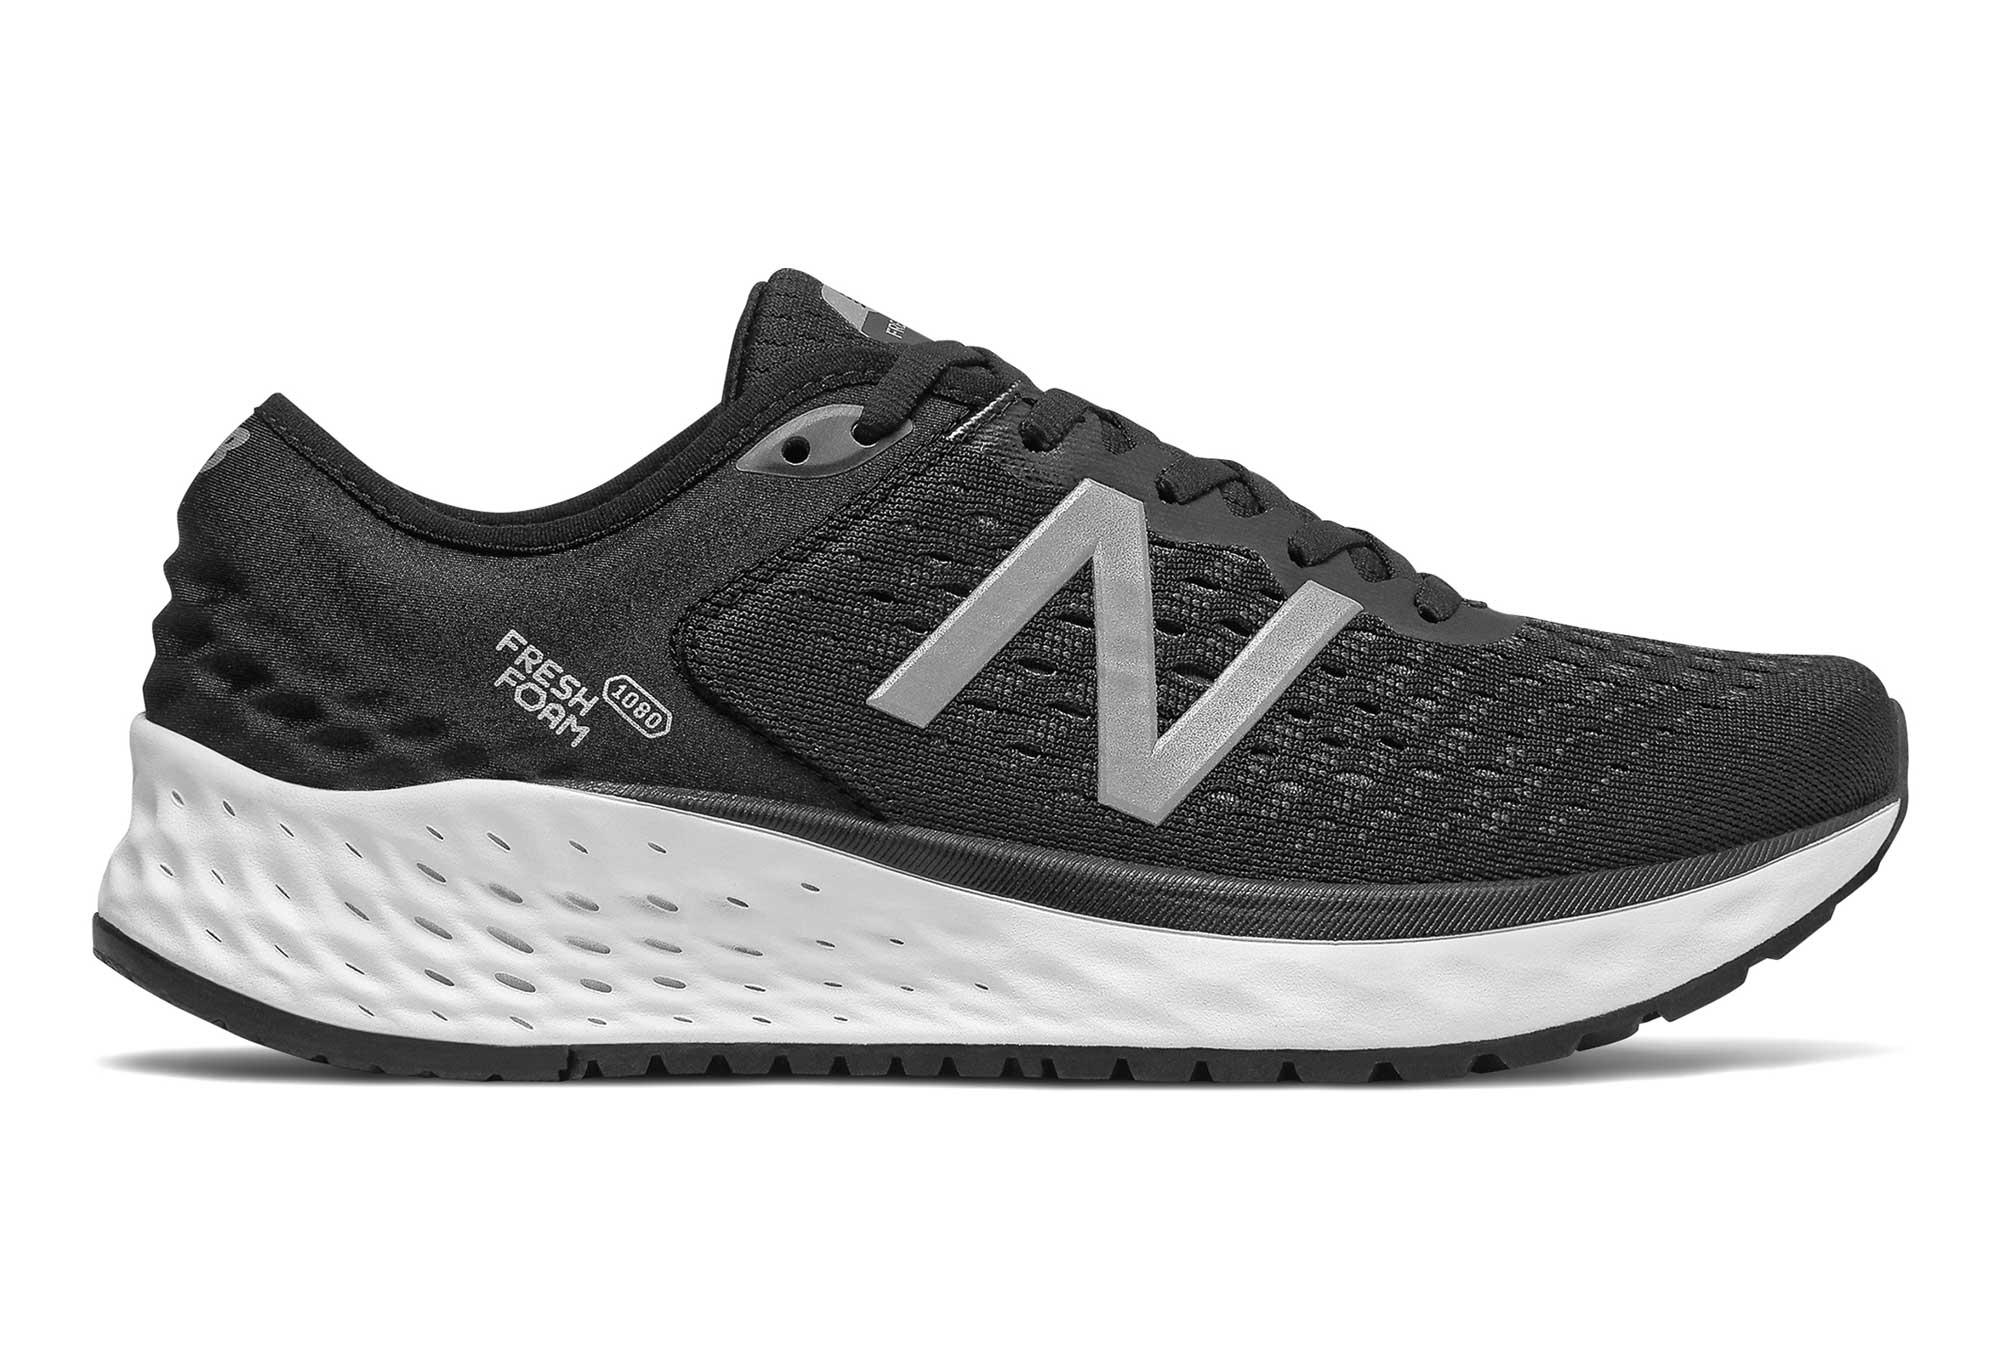 280a851770117 Zapatillas New Balance Fresh Foam 1080 V9 para Mujer Negro   Blanco